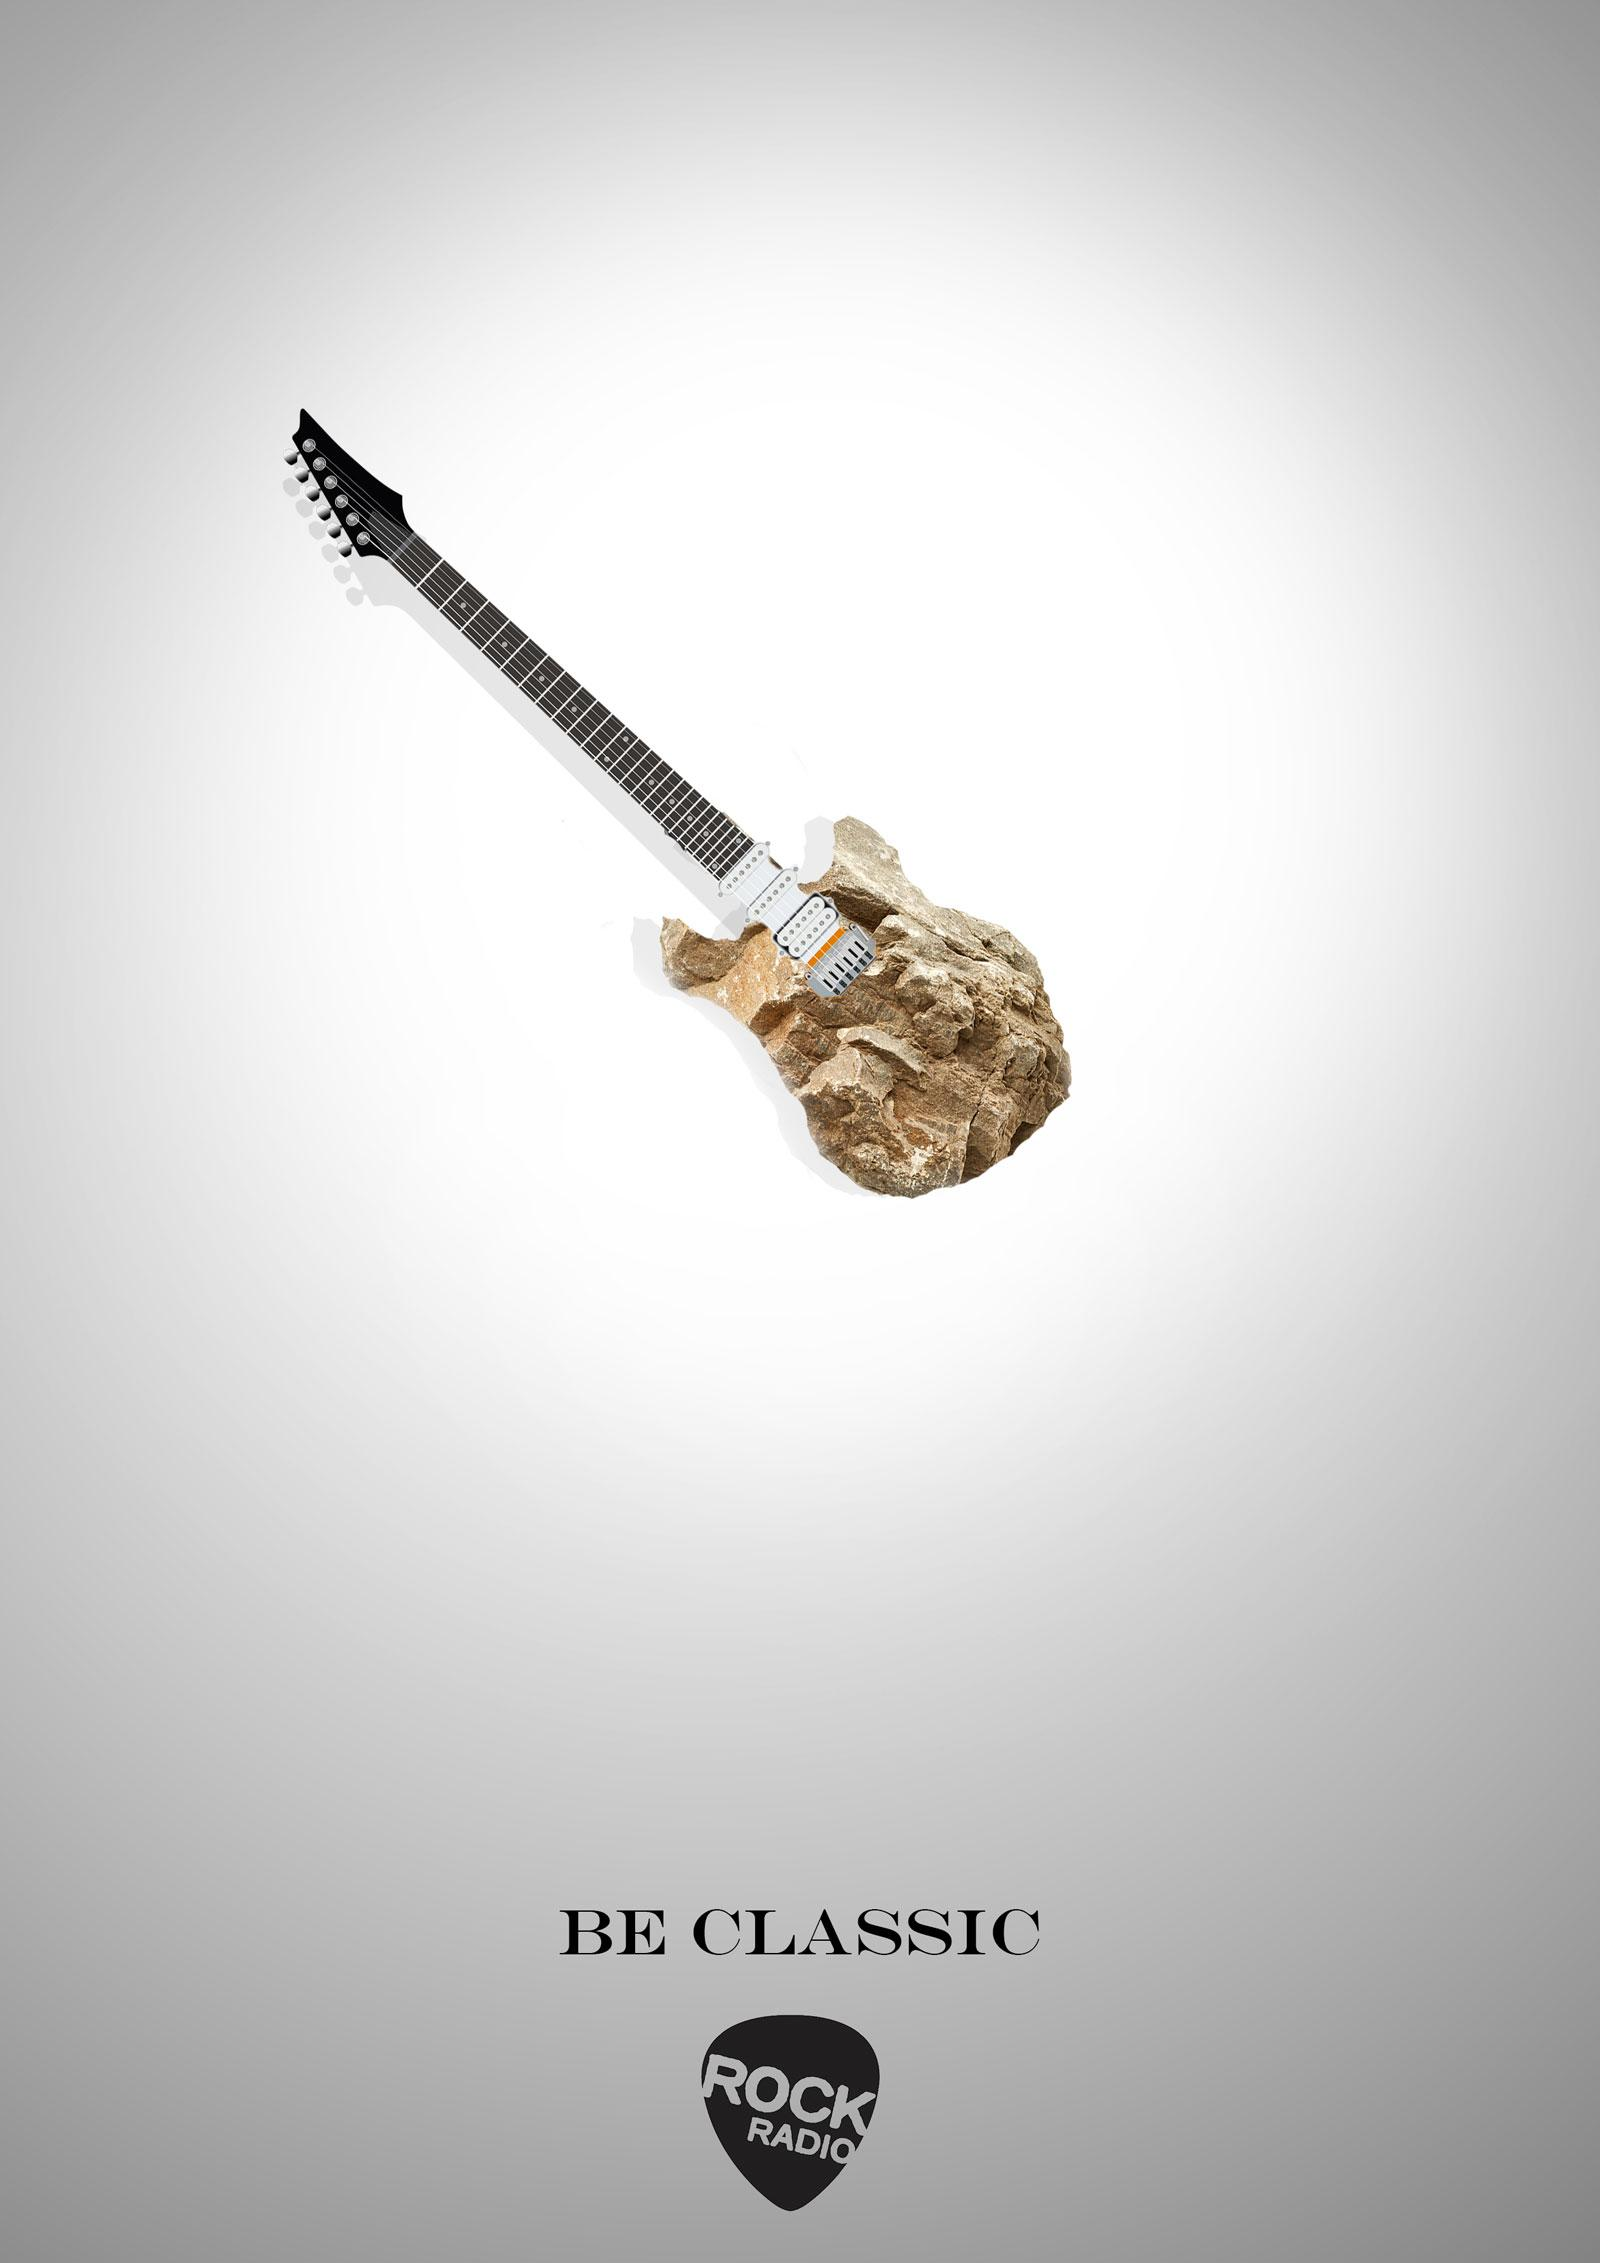 Rock Radio Print Ad - Guitar